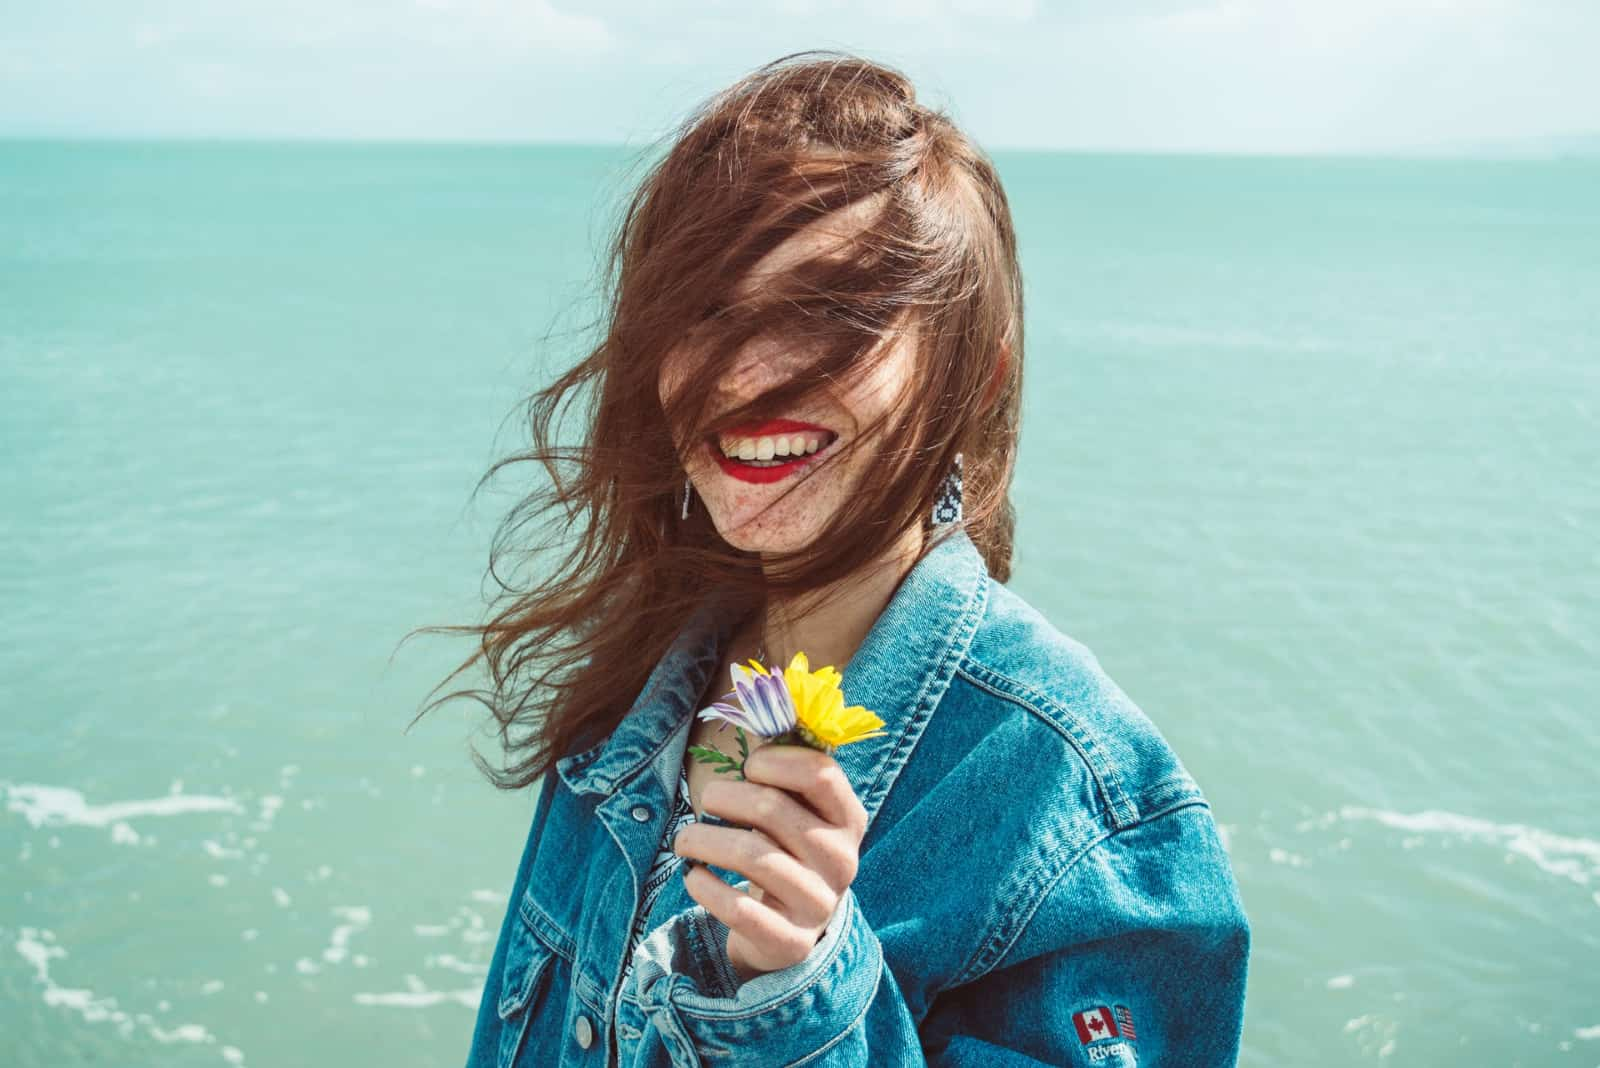 femme en veste en jean souriant en tenant une fleur